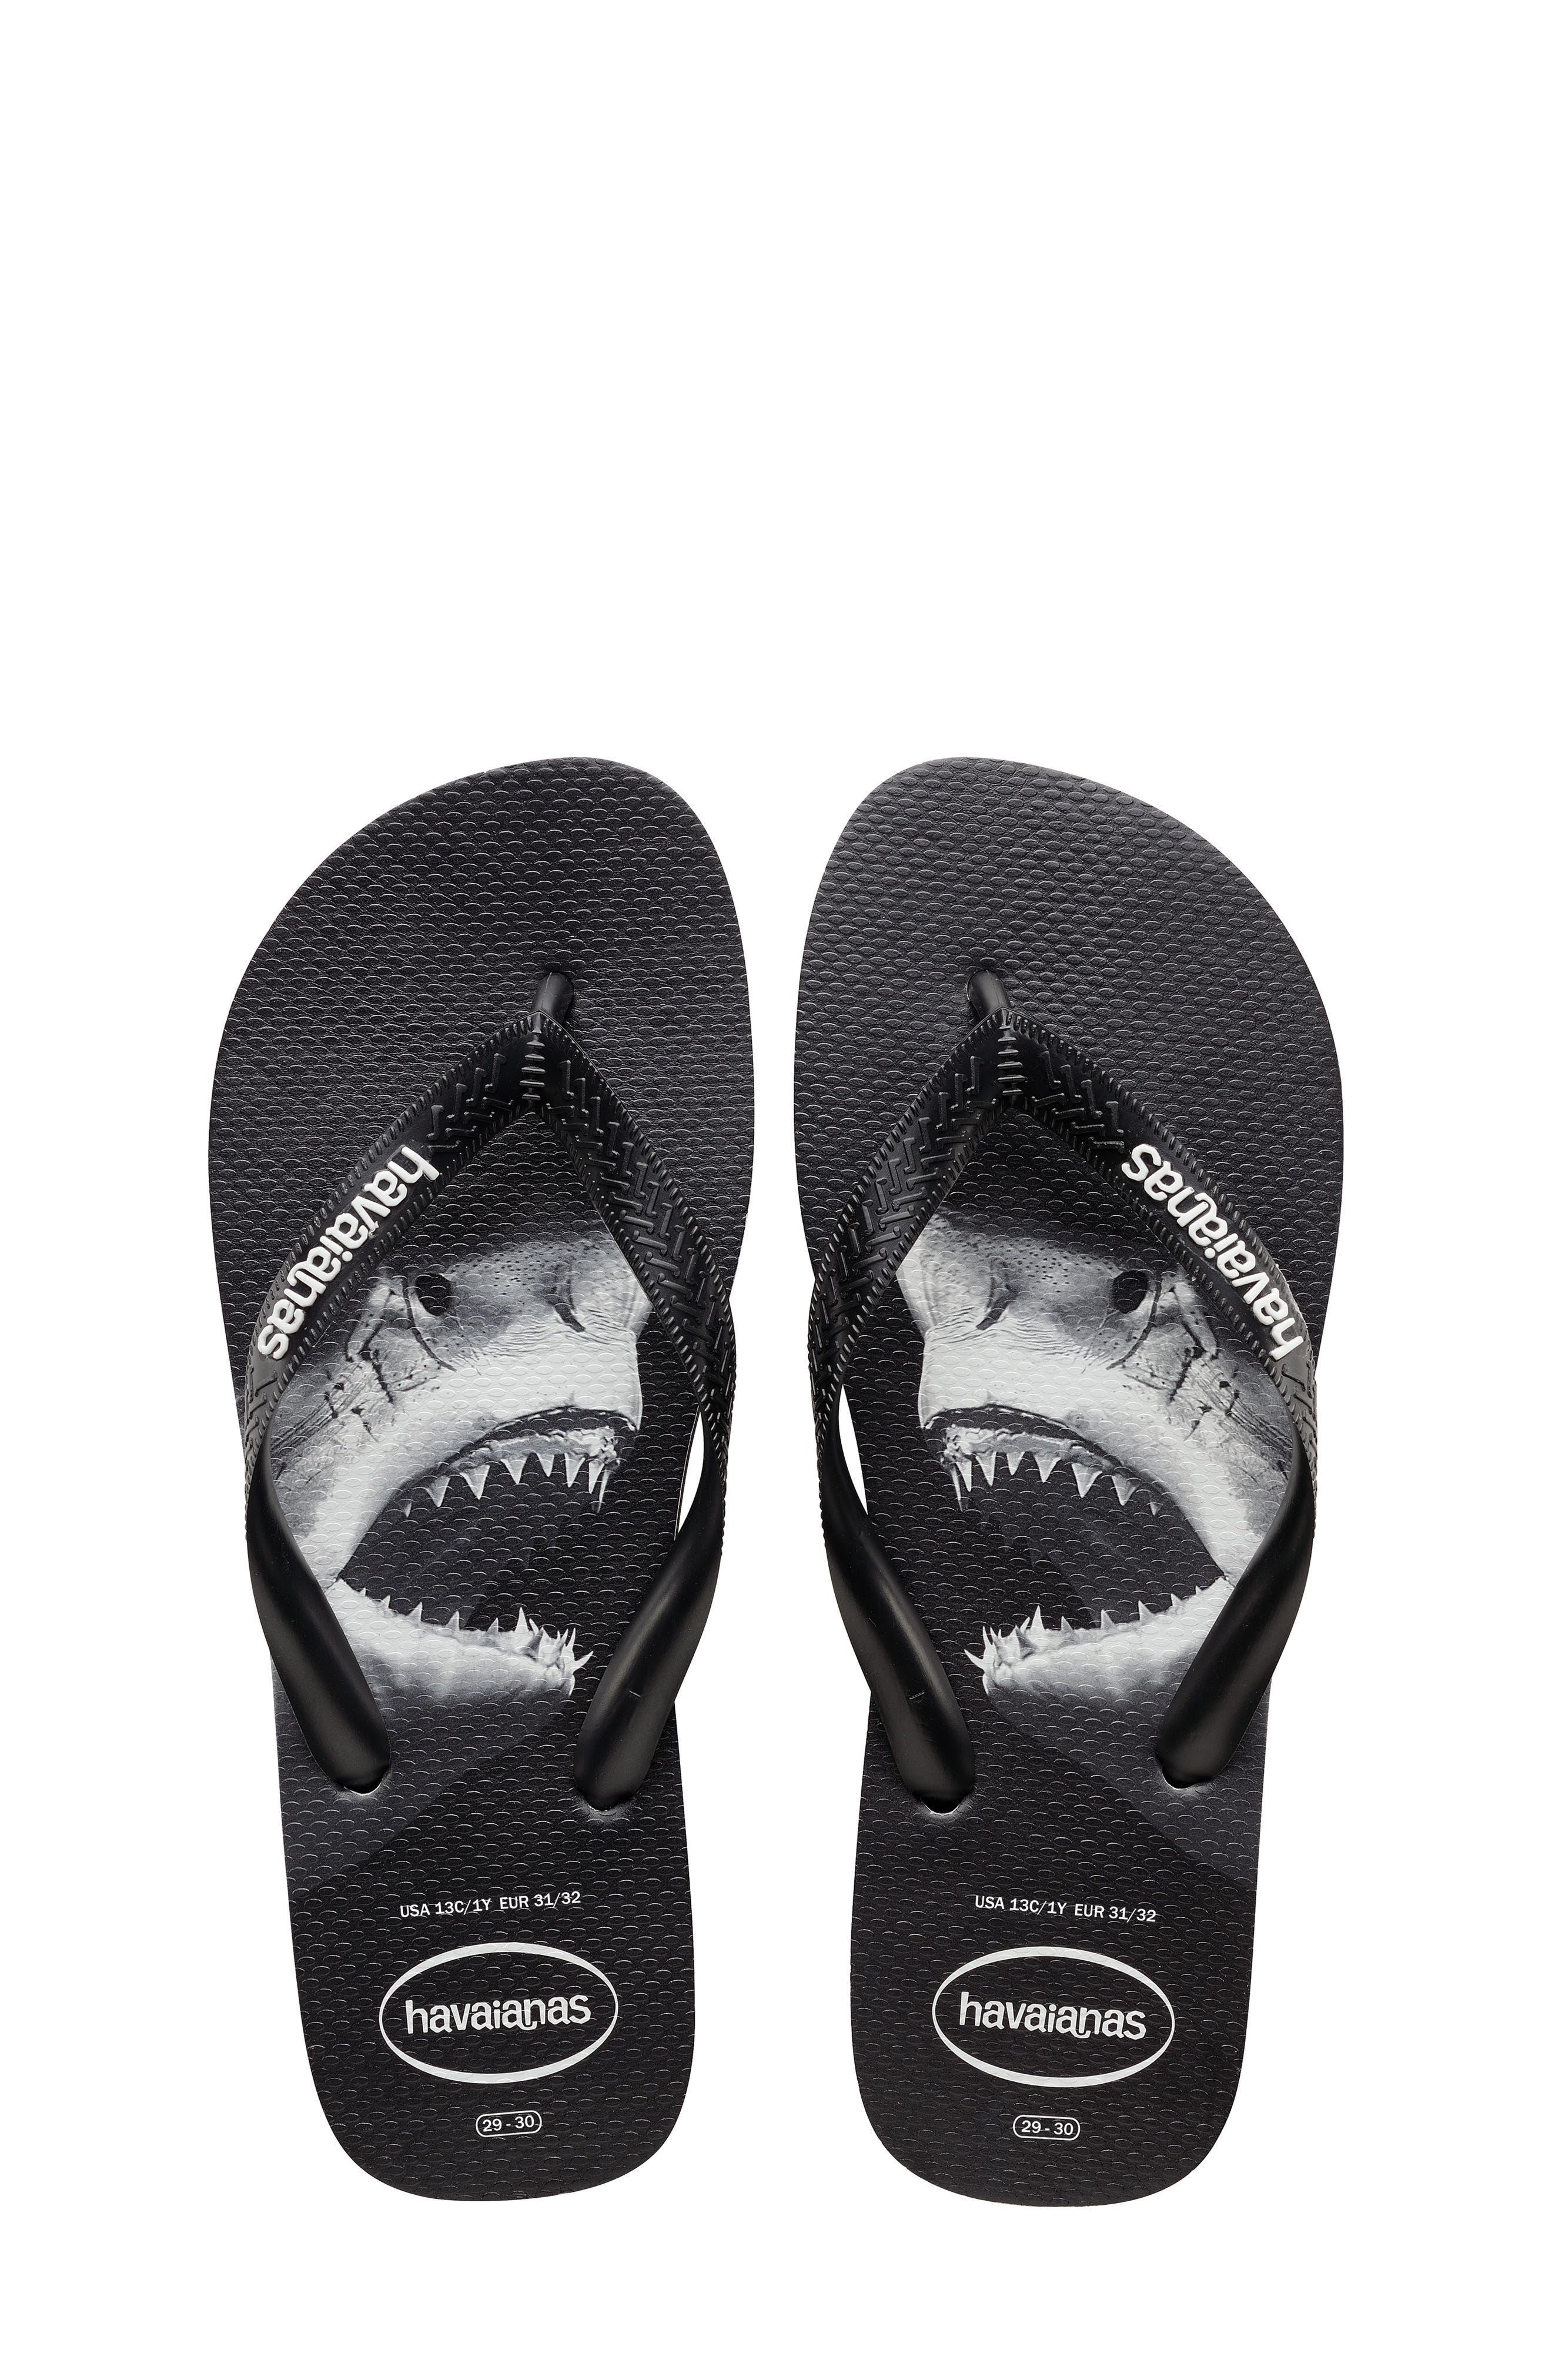 Toddler Boys Havianas Shark Bite Flip Flop Size 25 BR  Black